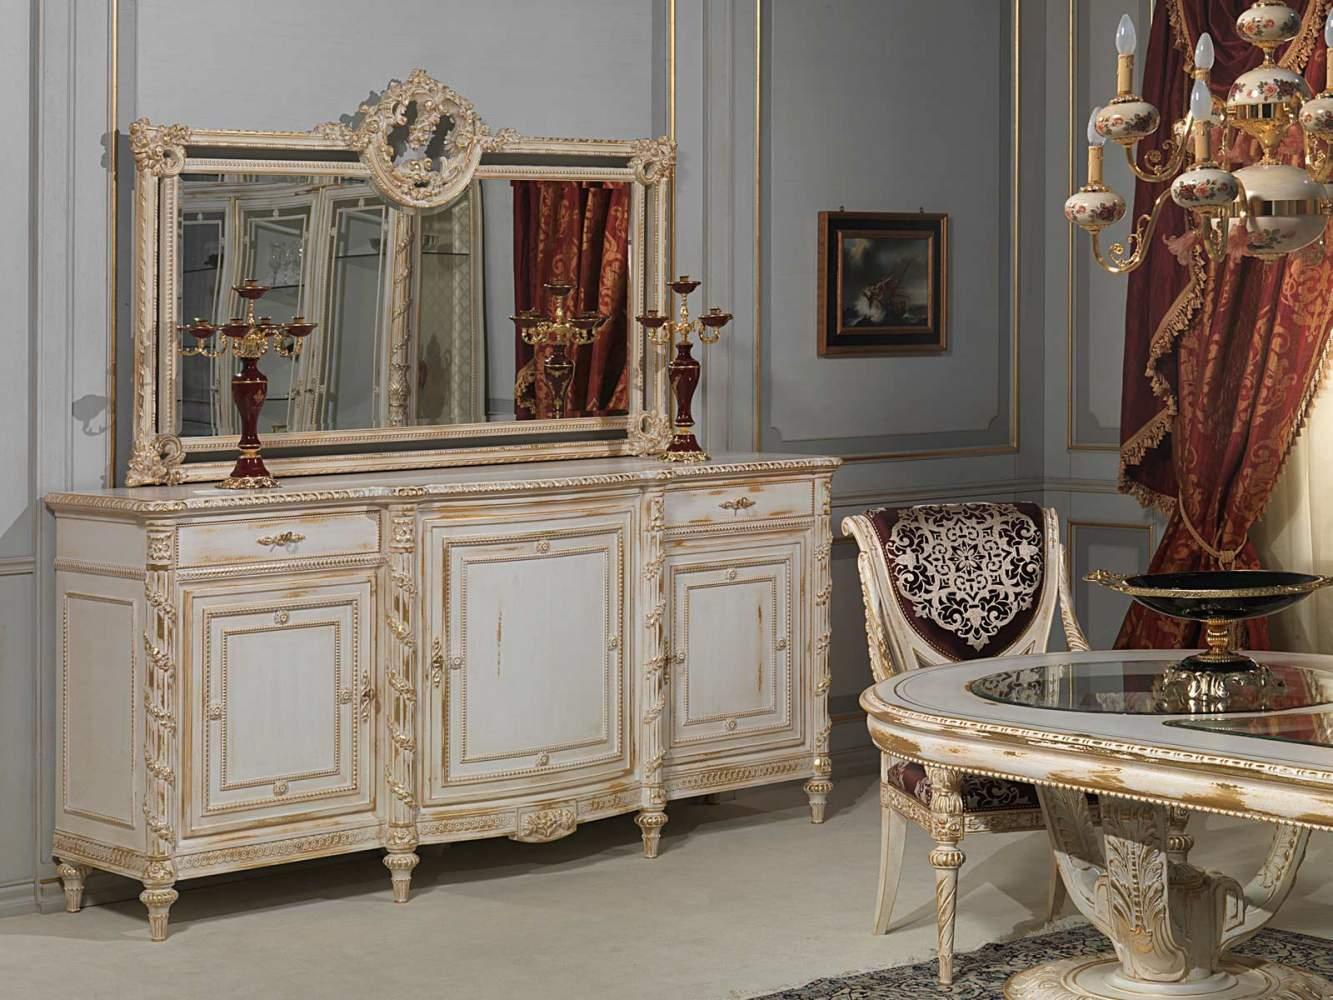 Sideboard in Louis XVI style